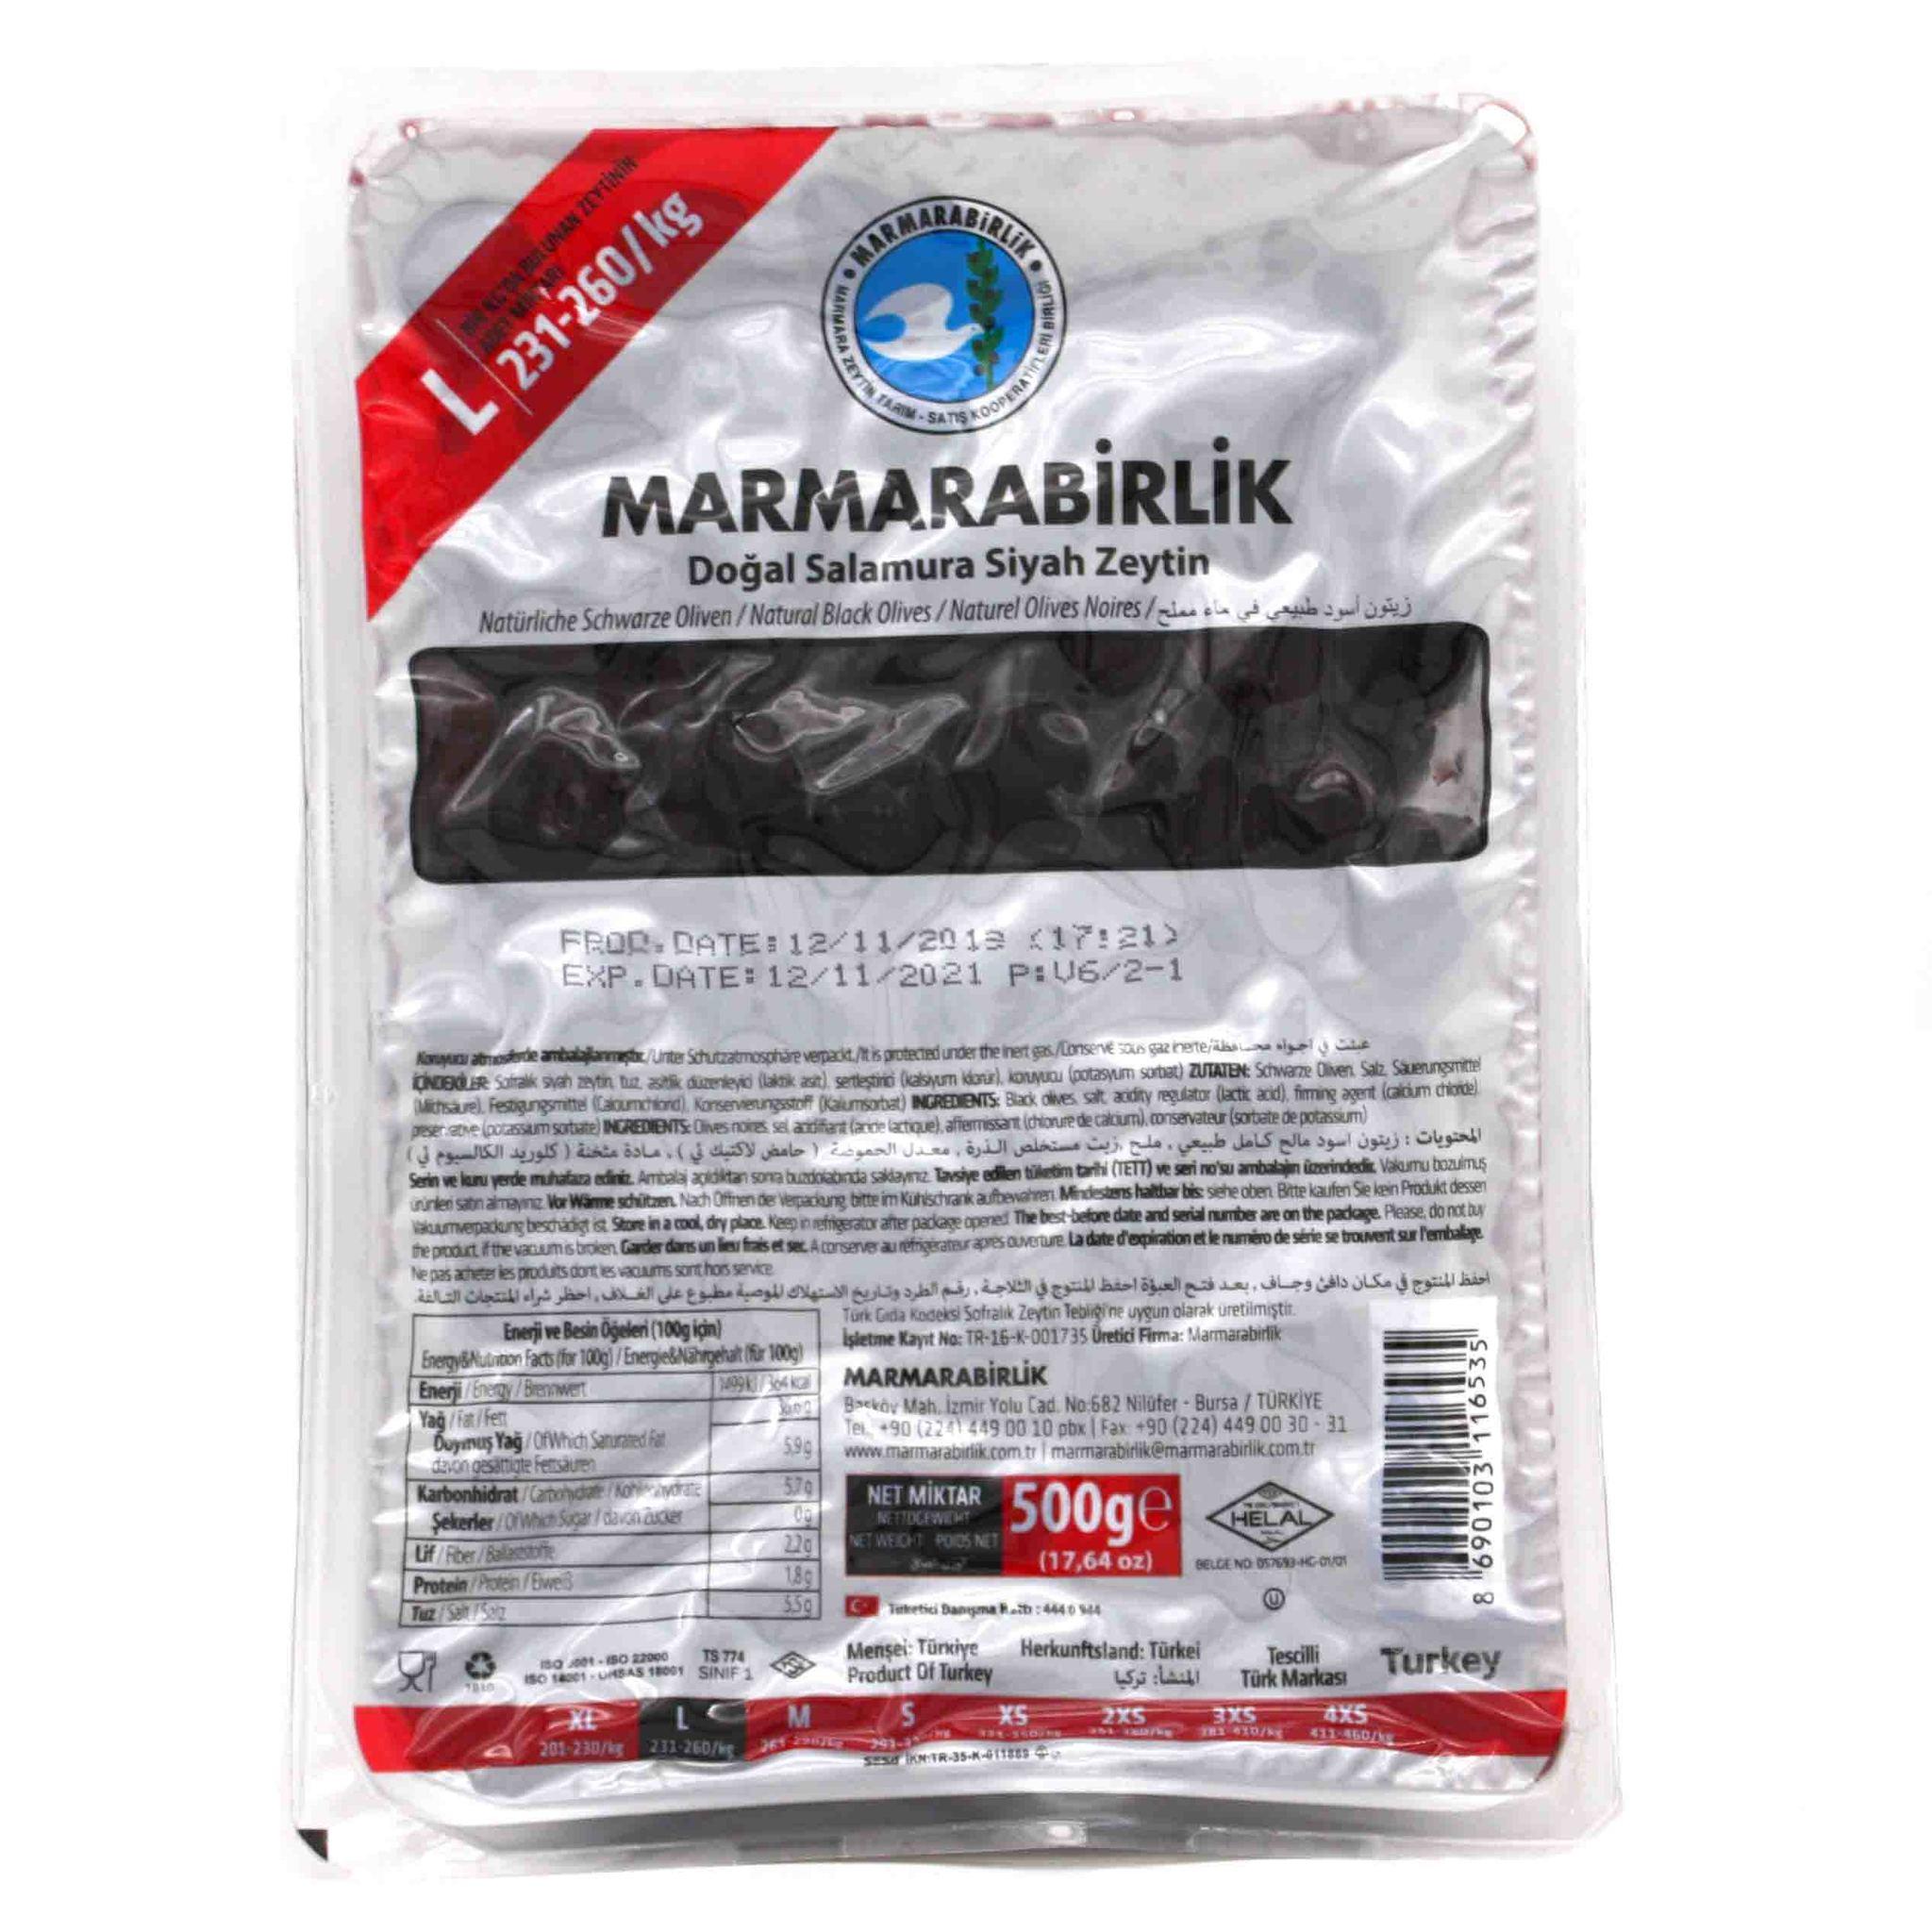 Marmarabirlik Маслины вяленые в вакууме L, Marmarabilik, 500 г import_files_69_69c1bcdc474511eaa9c6484d7ecee297_a6b921df5d3c11eaa9c7484d7ecee297.jpg